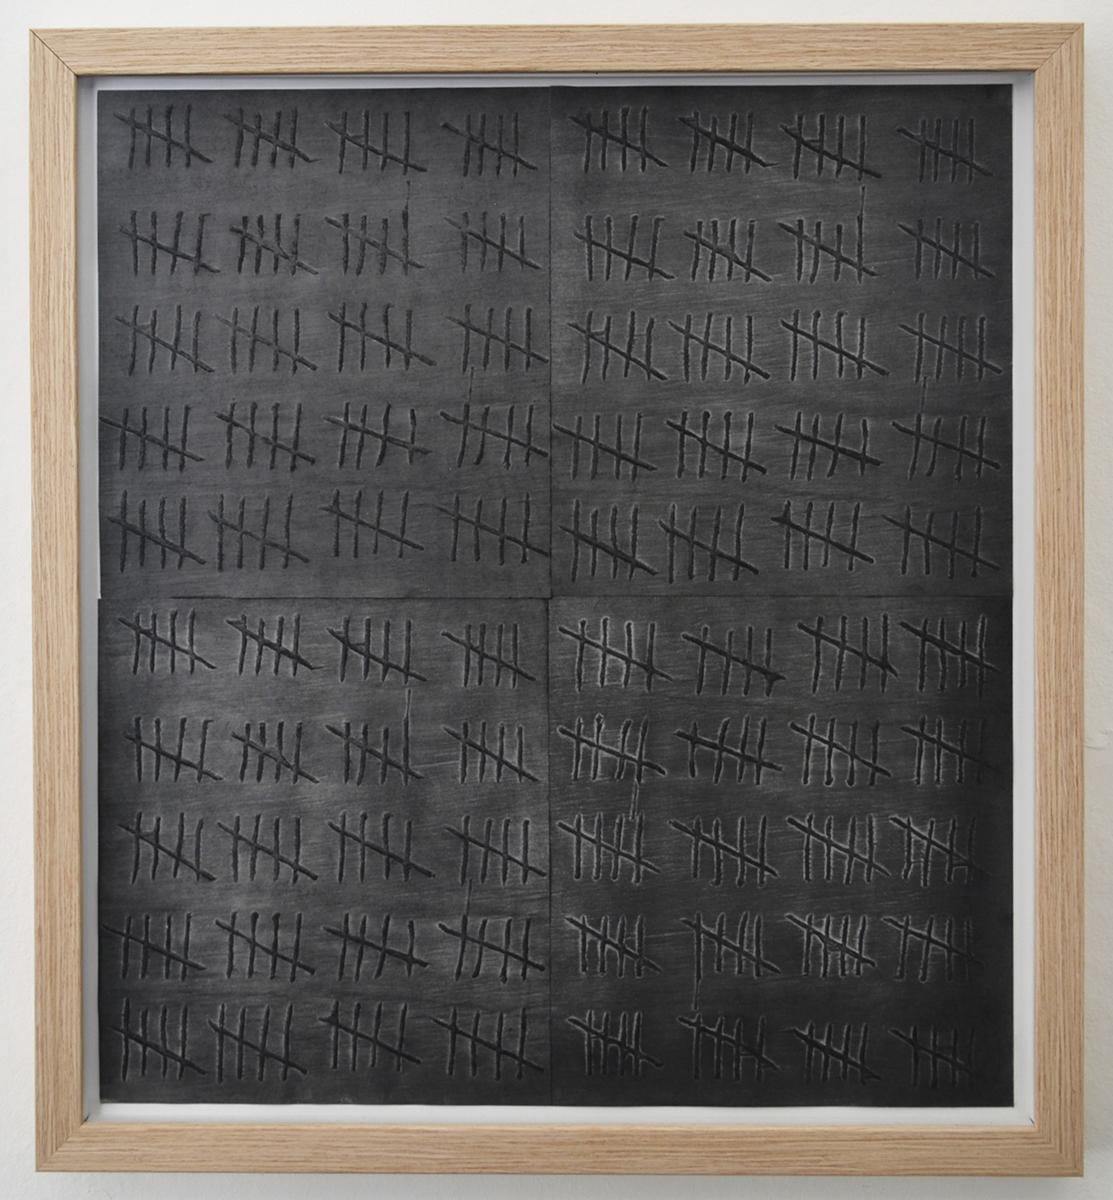 19 Anna Bak   400, 2019   Woodcut, graphite dust on paper, 55 x 50 cm. Marie Kirkegaard Gallery